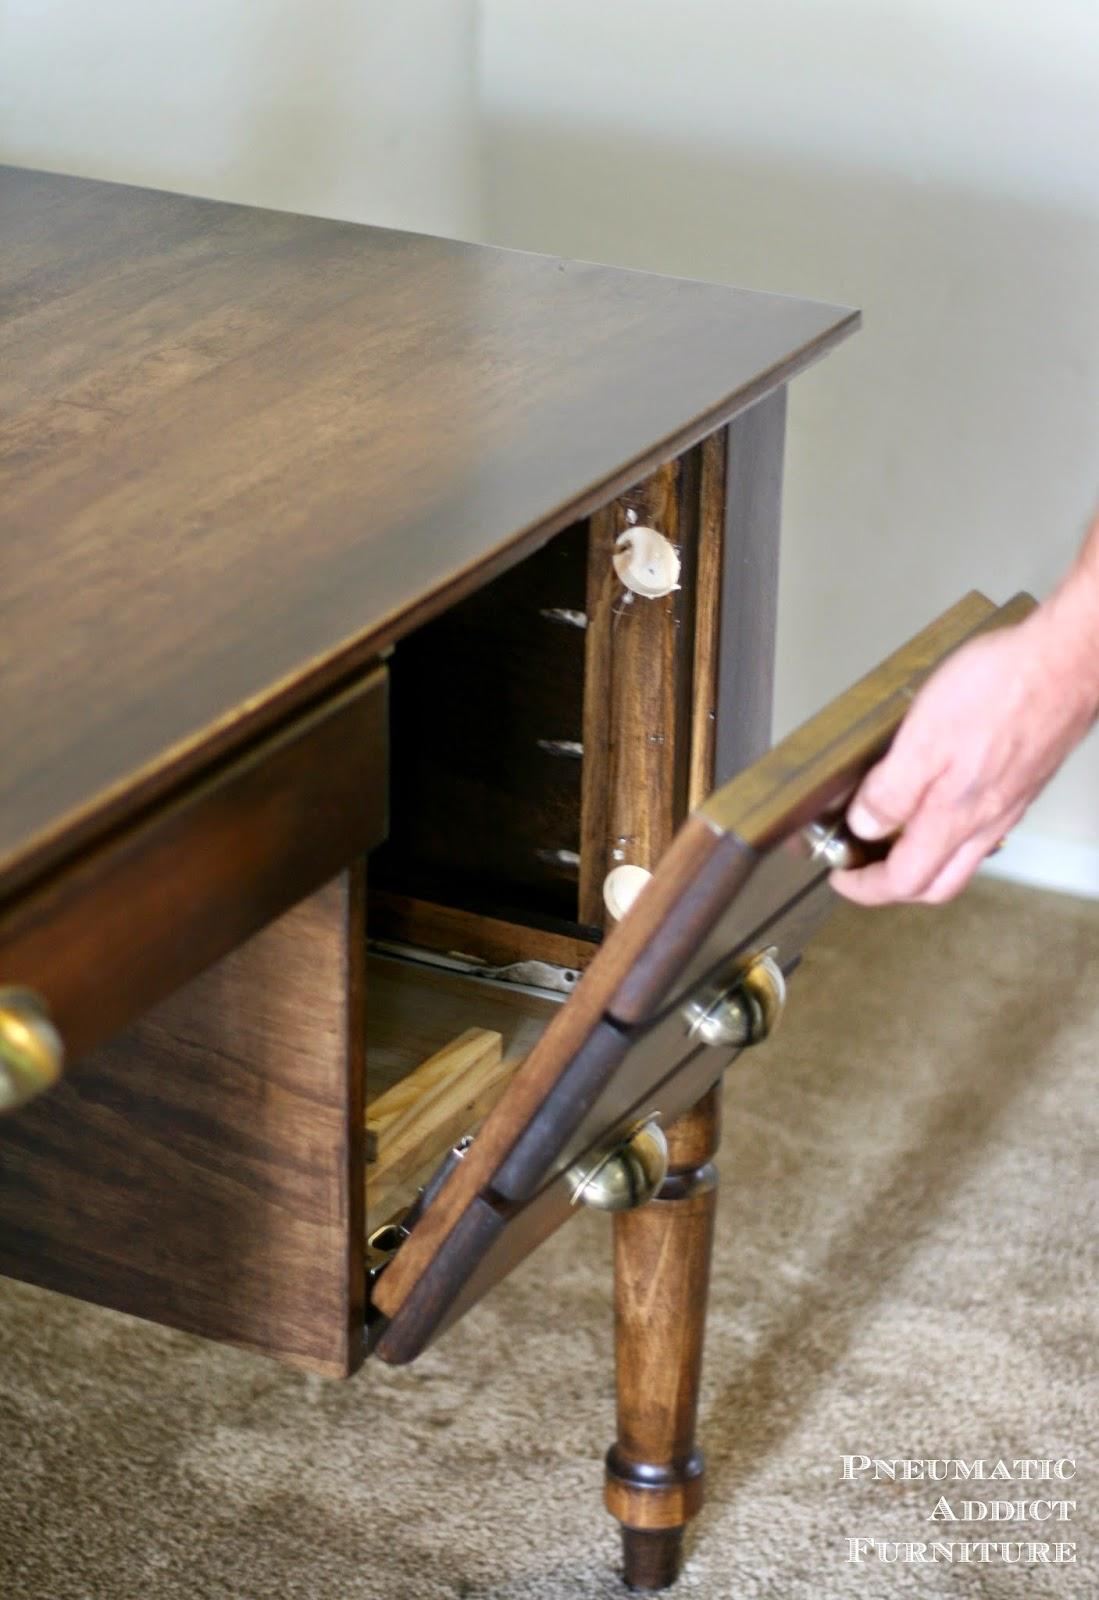 Pneumatic Addict : Pottery Barn Printer's Keyhole Desk Knock-off Tutorial